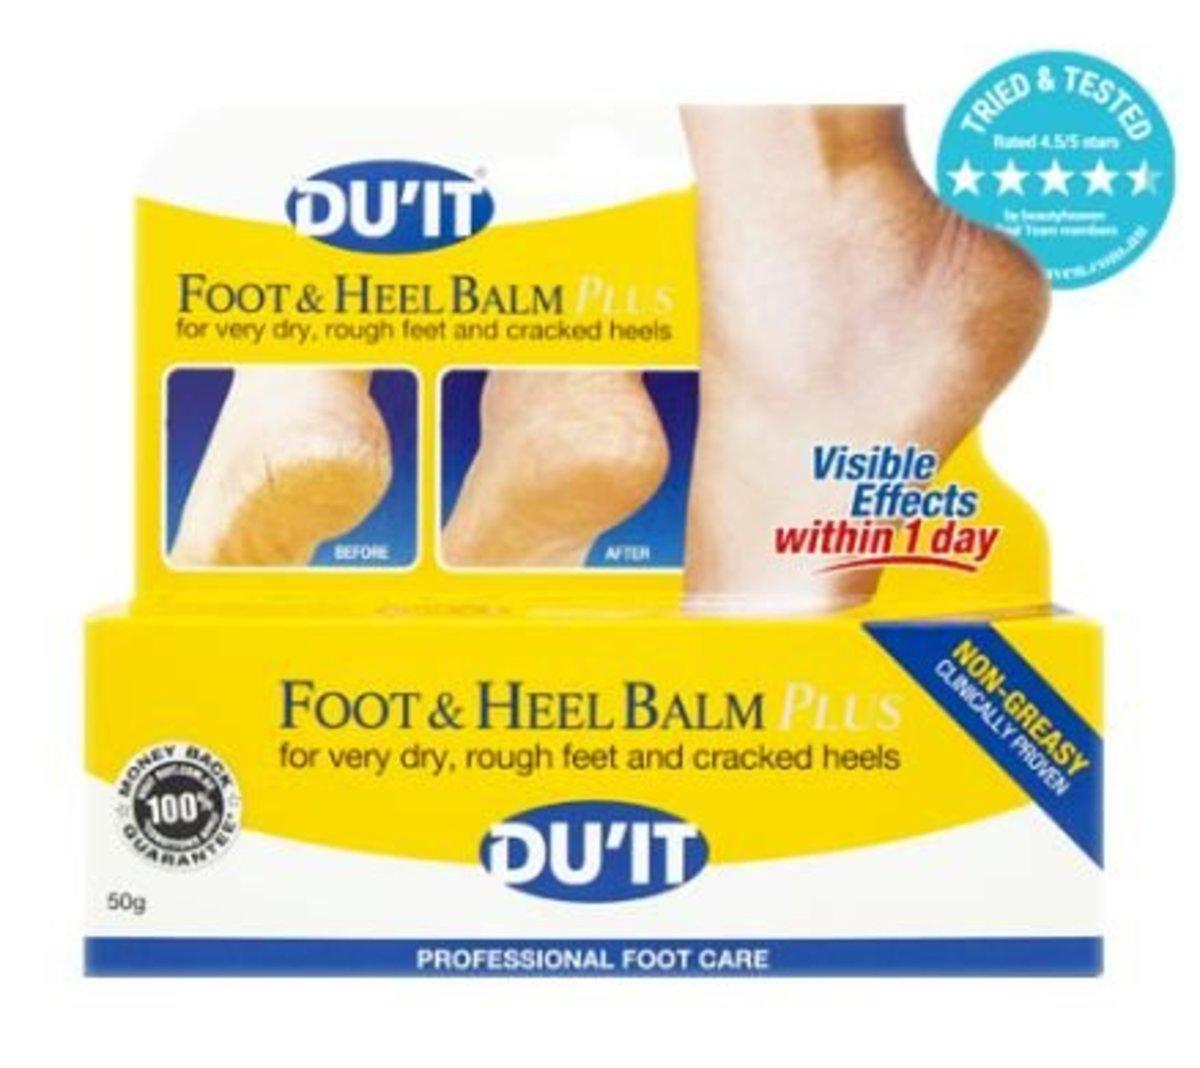 Du'it Foot & Heel Balm Plus 50g (Parallel import)